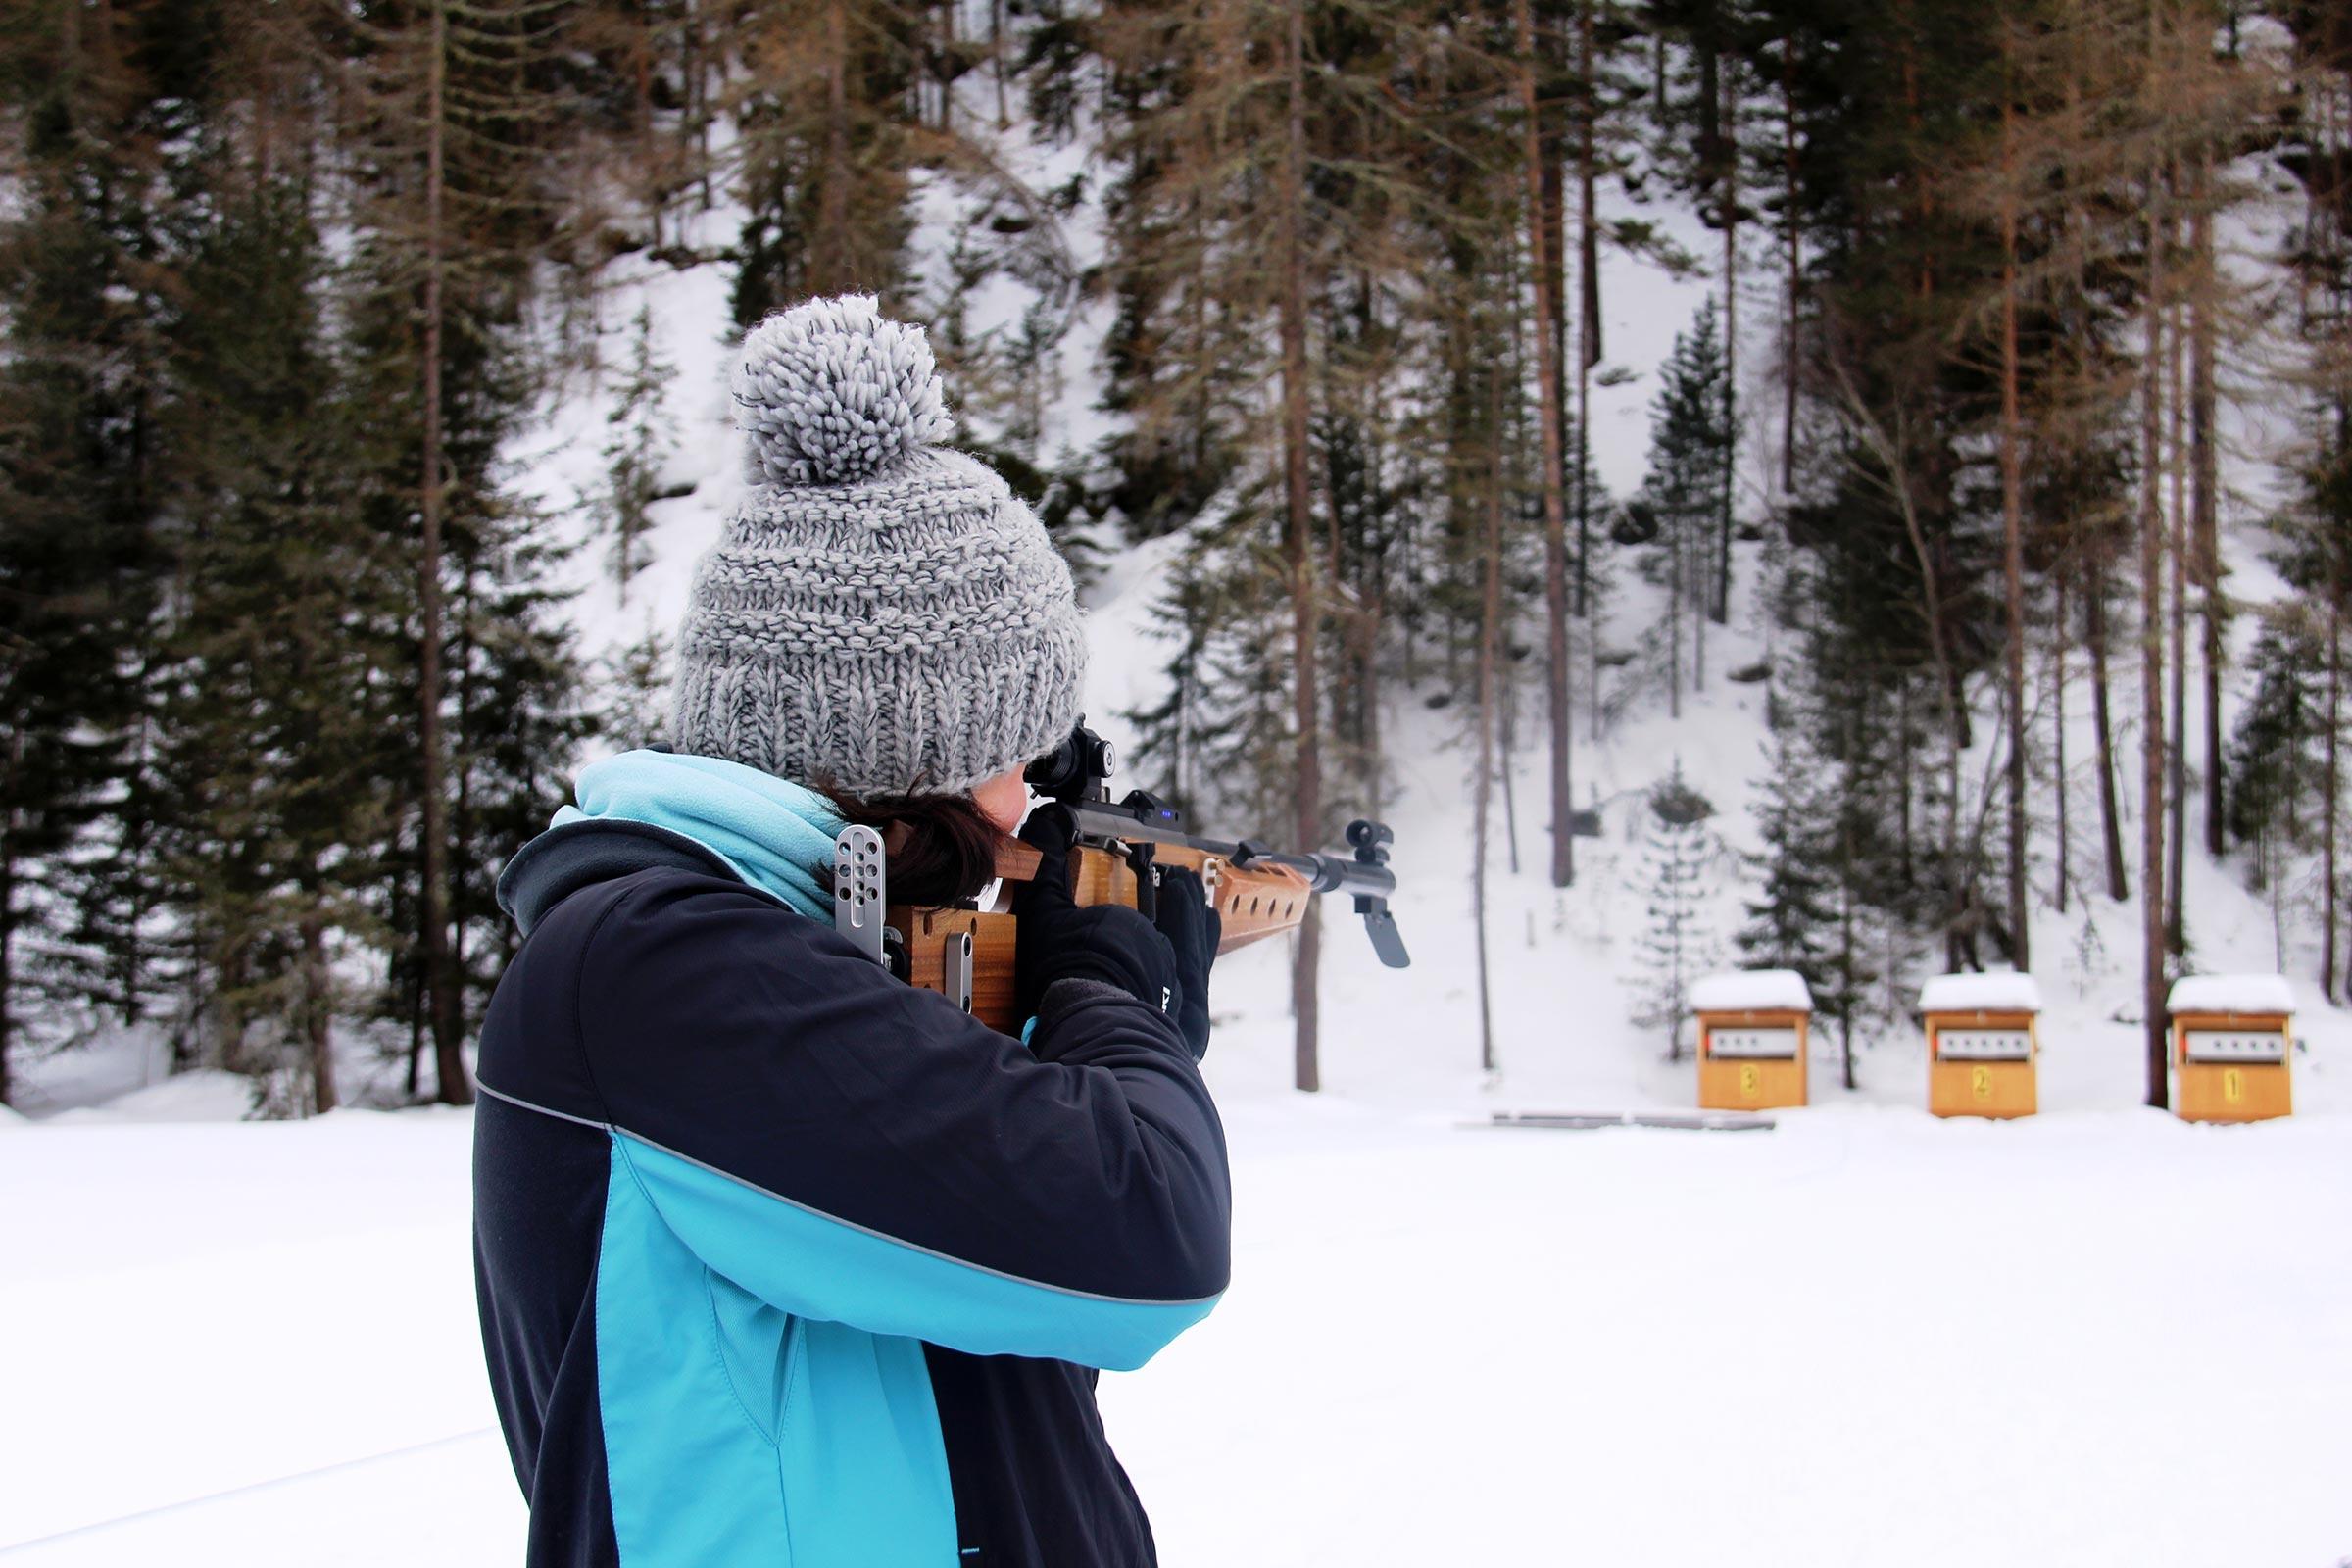 Biathlon in Niederthai - Niederthai Card